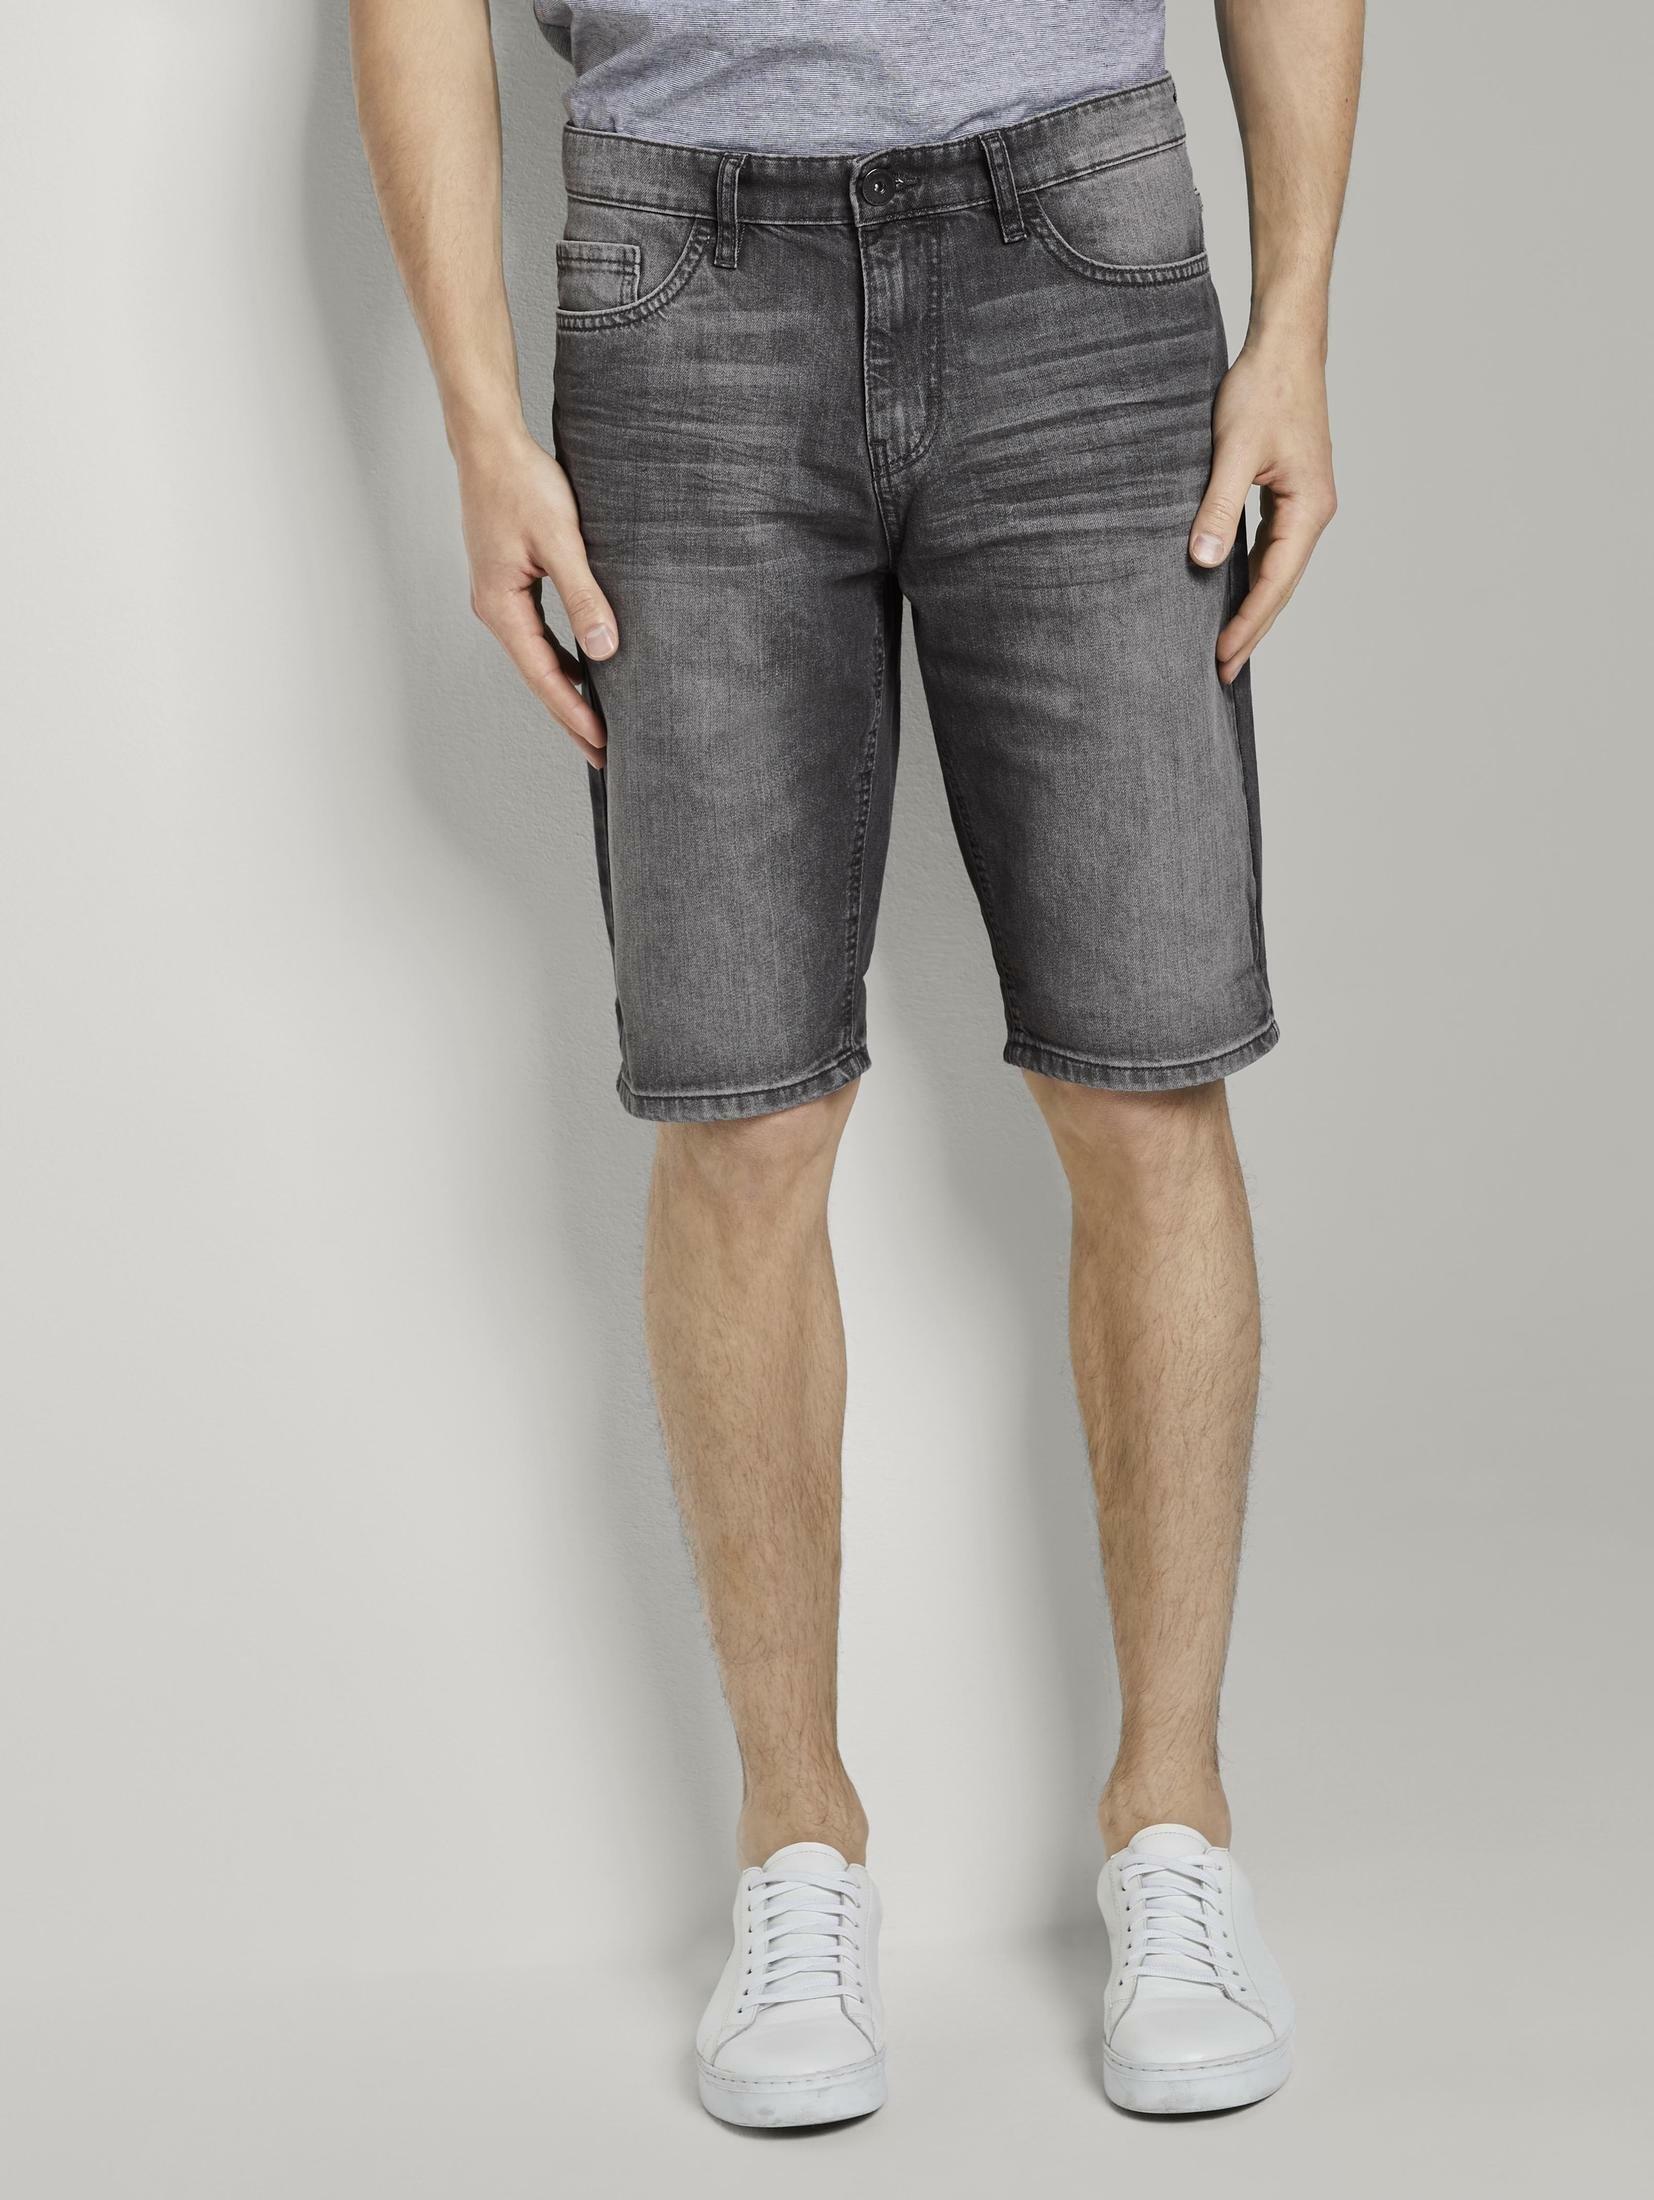 Tom Tailor slim fit jeans »Josh Regular Slim Jeans-Shorts in Vintage-Waschung« nu online kopen bij OTTO